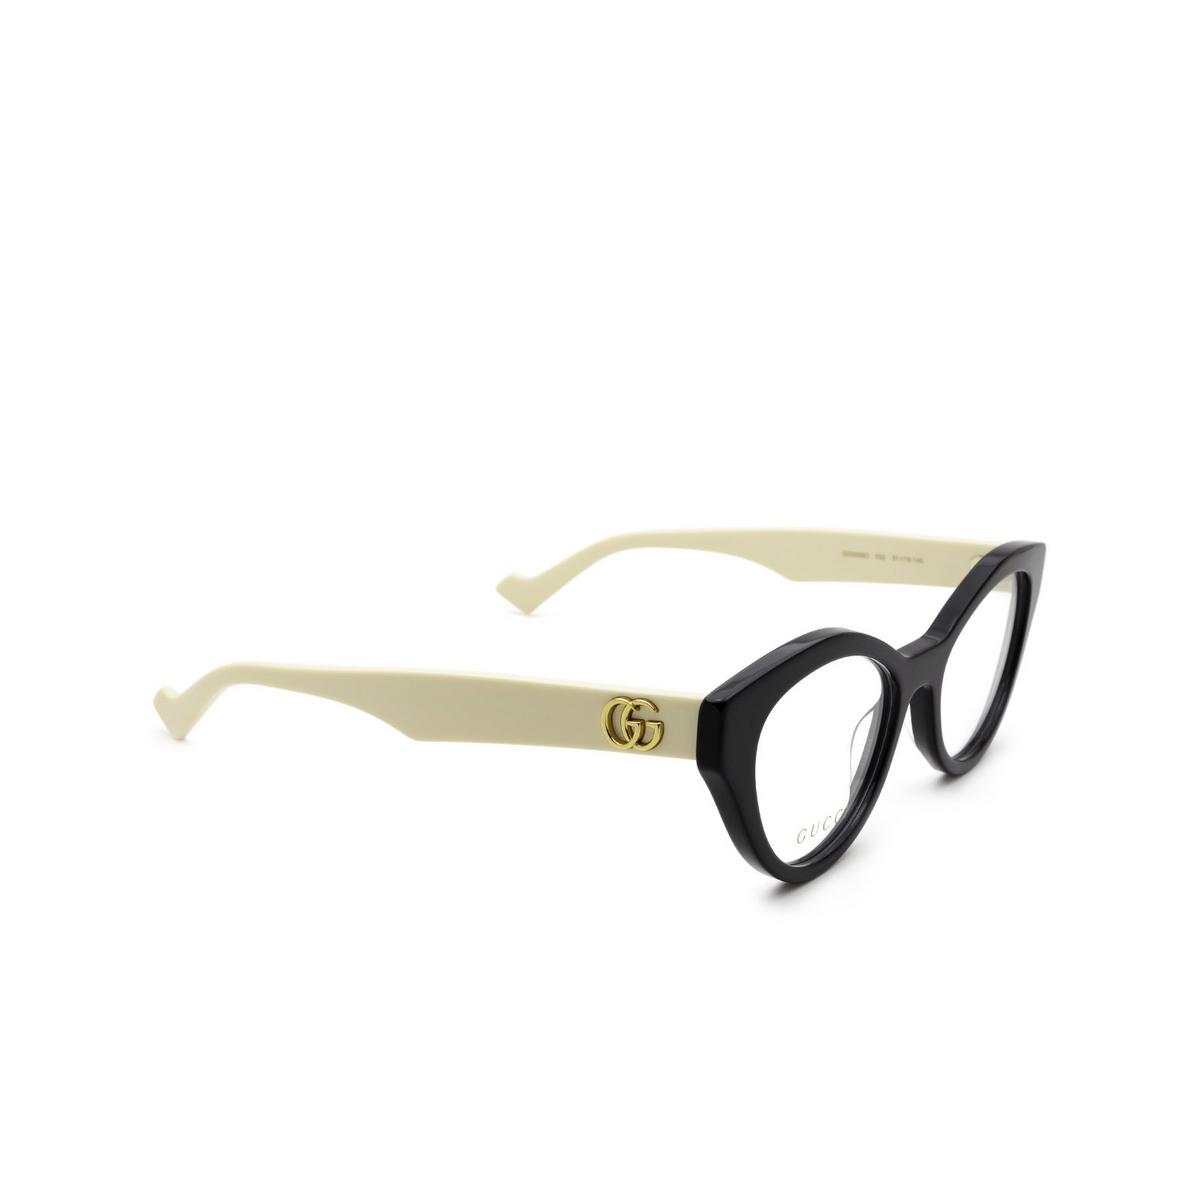 Gucci® Cat-eye Eyeglasses: GG0959O color Black & Ivory 002 - three-quarters view.